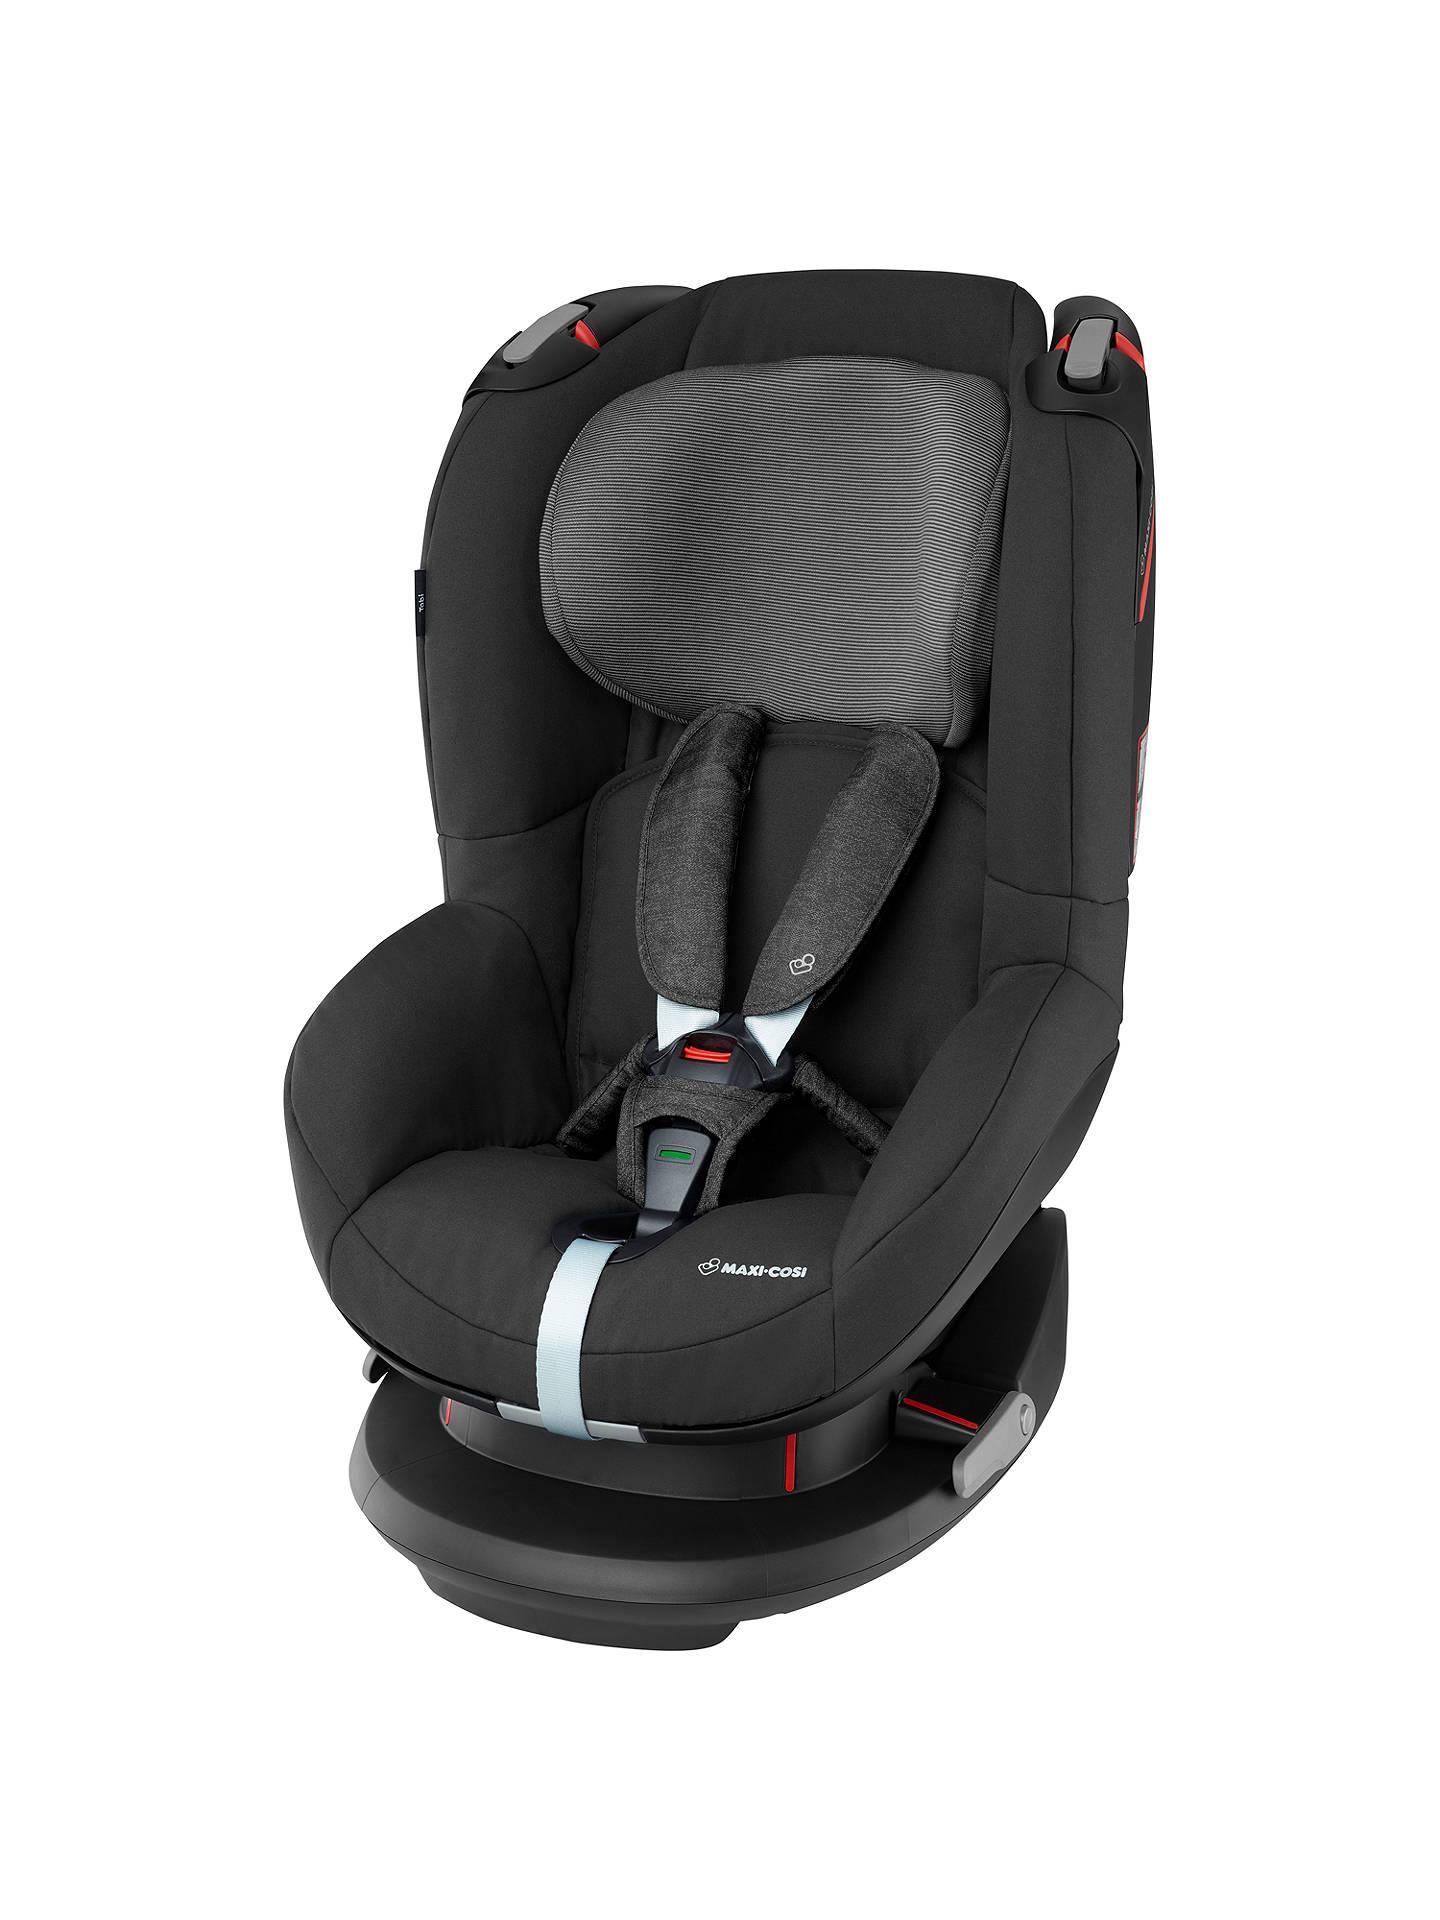 maxi cosi tobi group 1 car seat nomad black at john lewis. Black Bedroom Furniture Sets. Home Design Ideas